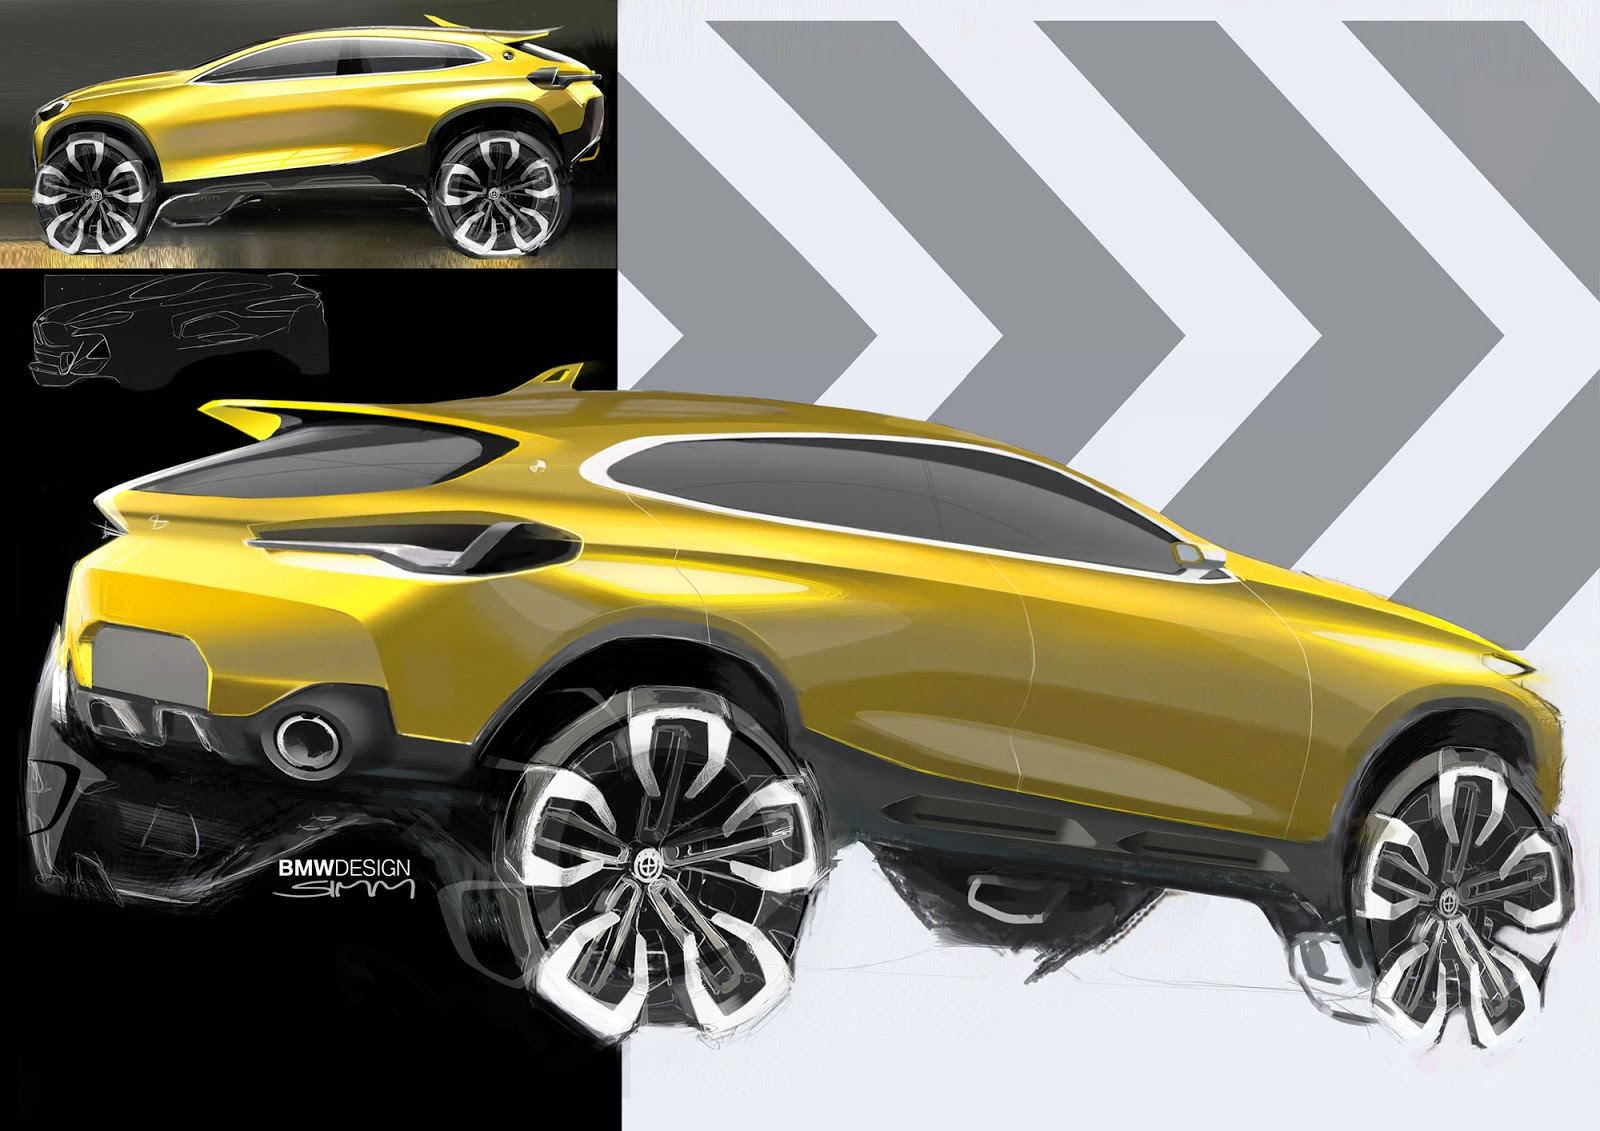 BMW X2 sketch by Sebastian Simm - rear quarter view in yellow